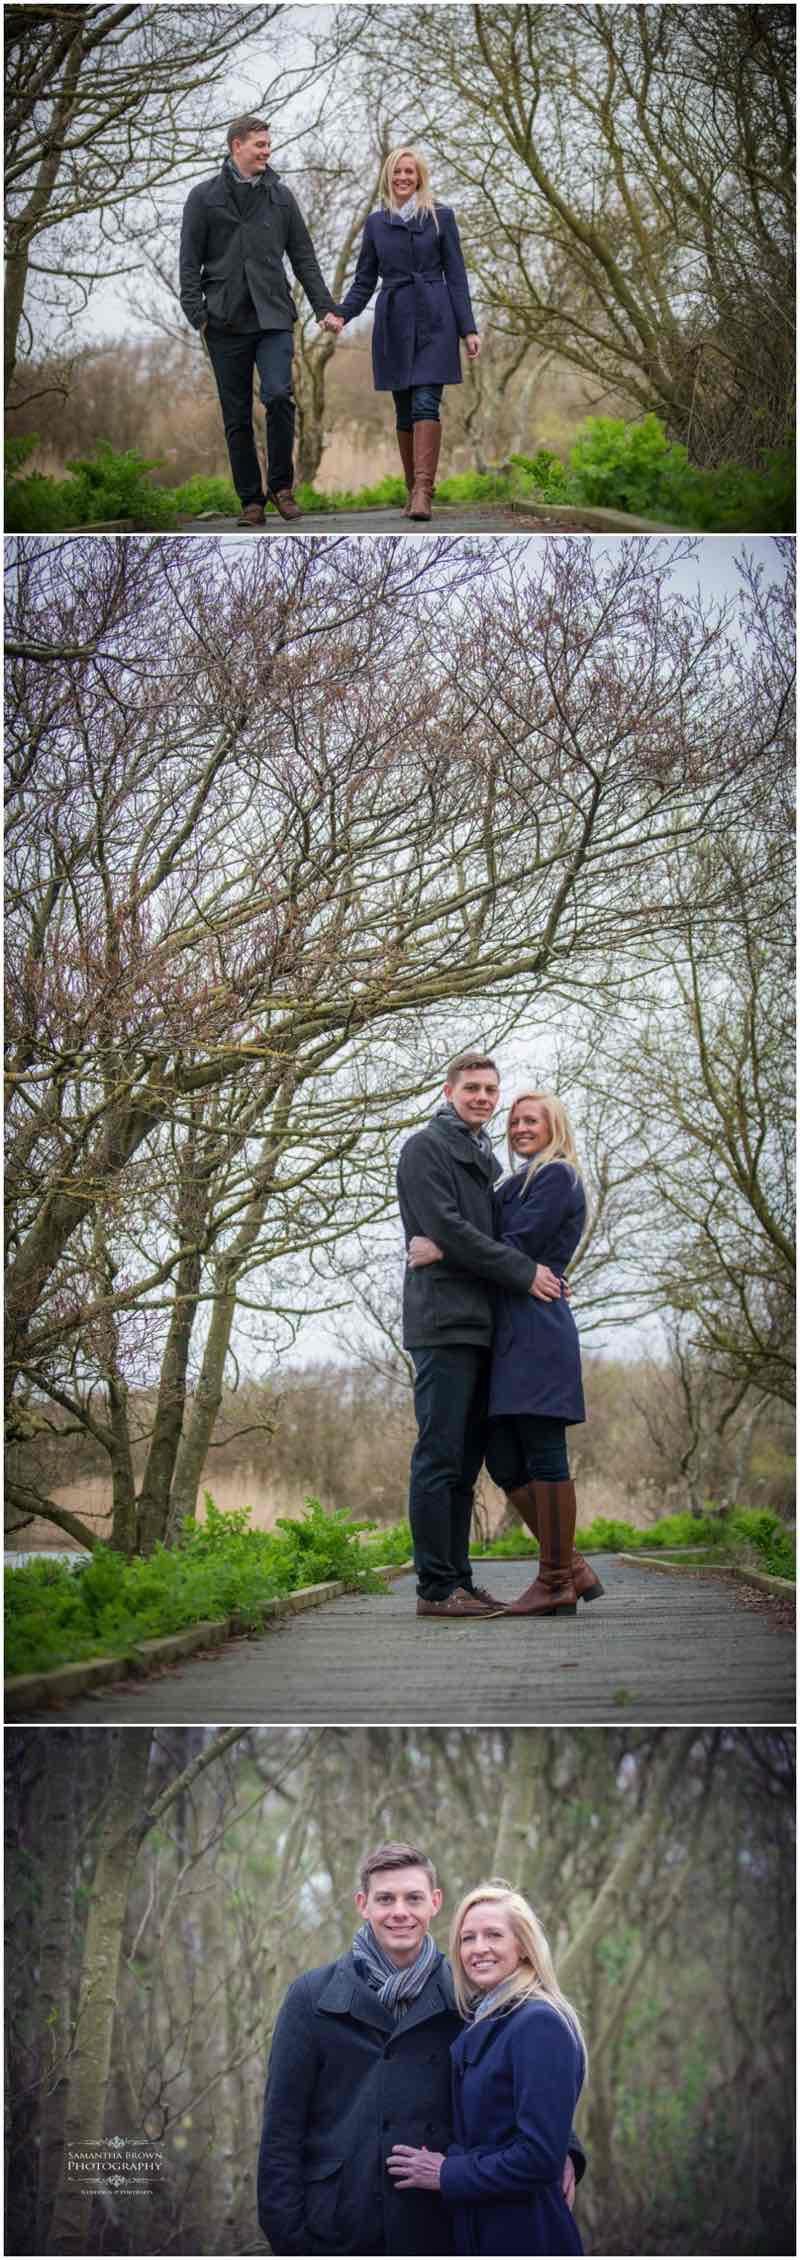 Steph & Geoff's Pre Wedding Shoot Ainsdale